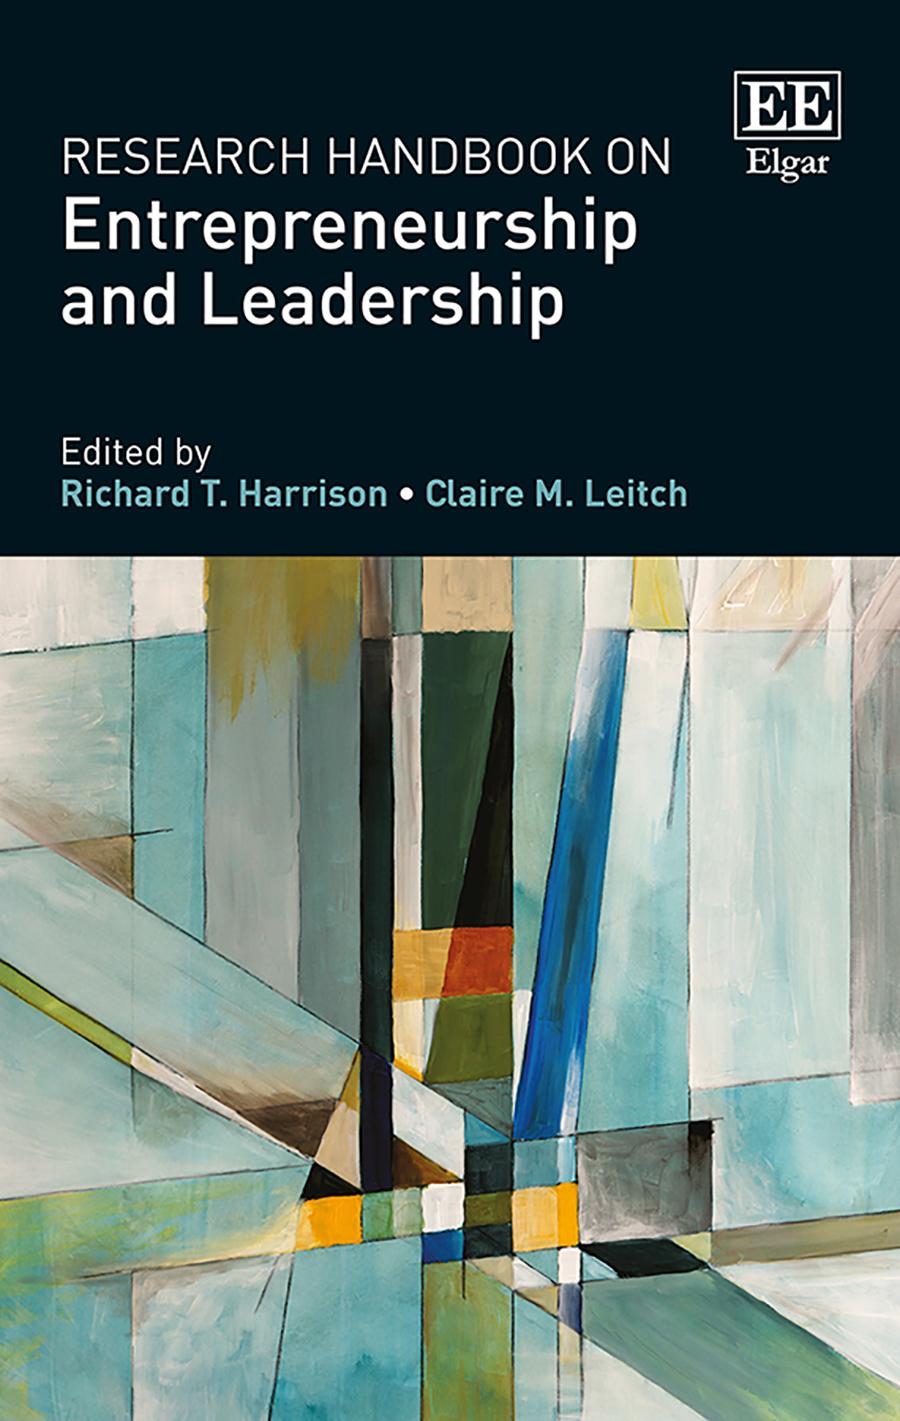 Download Ebook Research Handbook on Entrepreneurship and Leadership by Richard T. Harrison Pdf